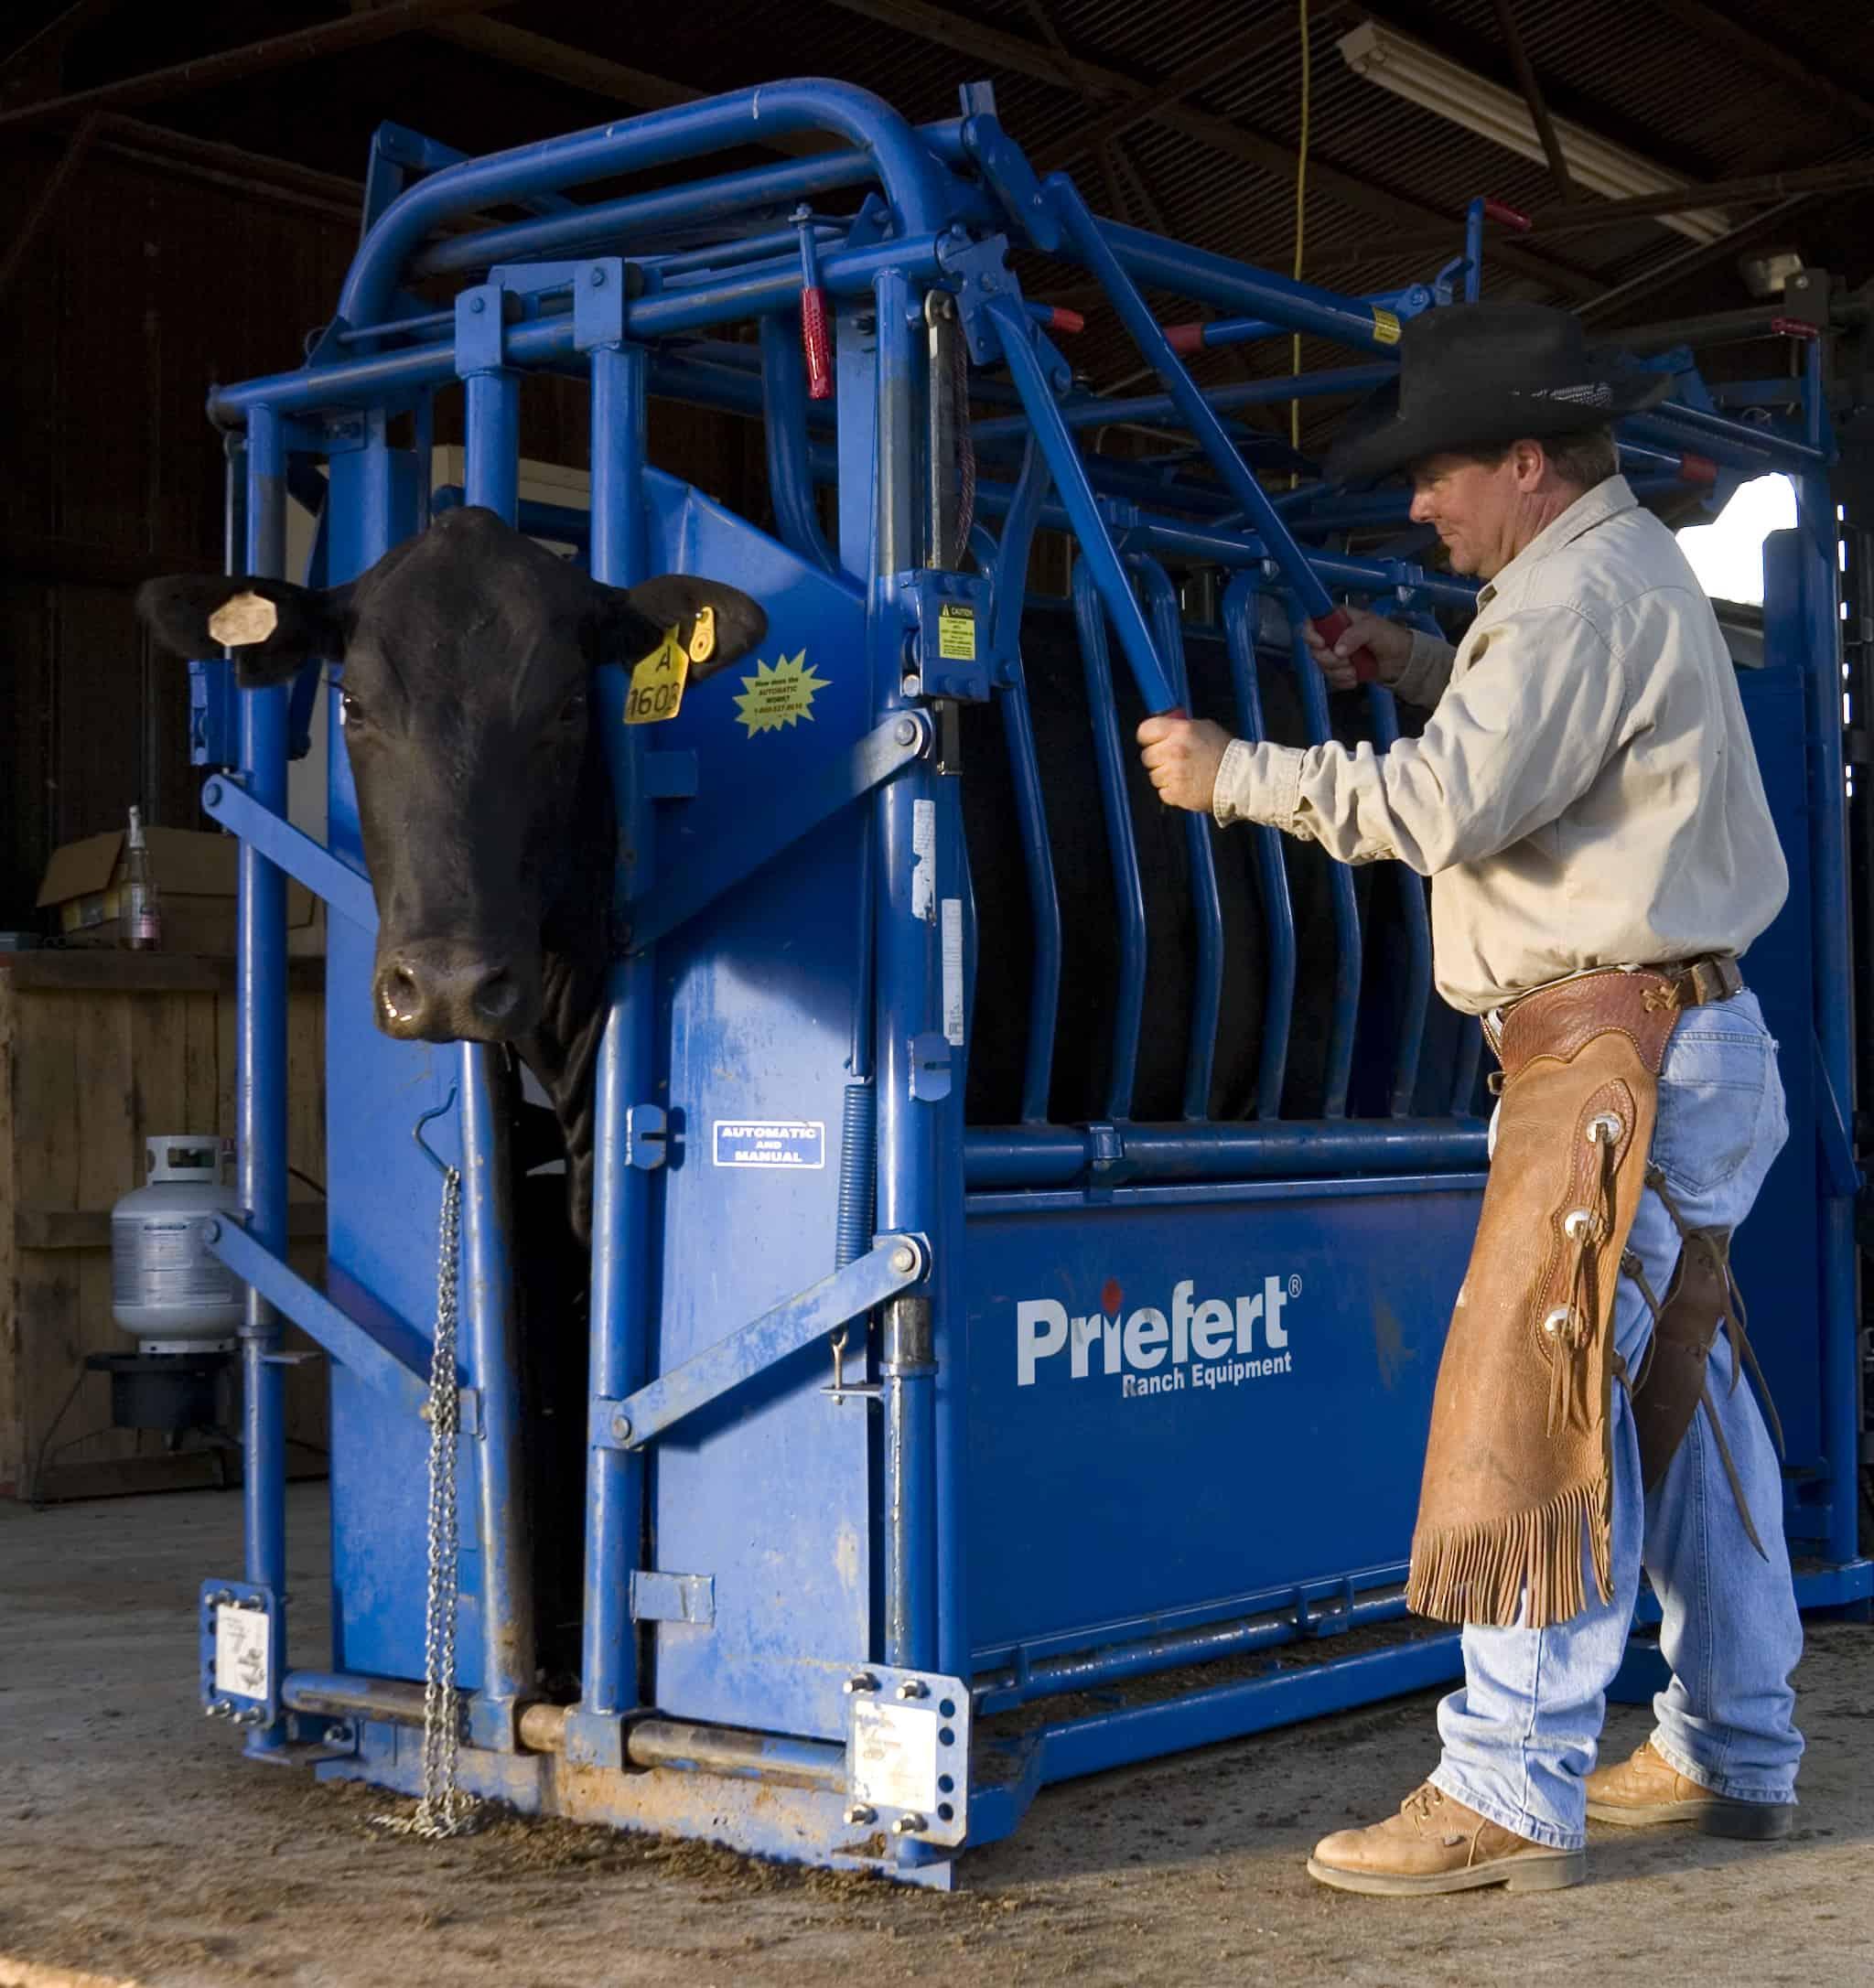 Priefert Livestock Squeeze Chute Model 04 Robertson